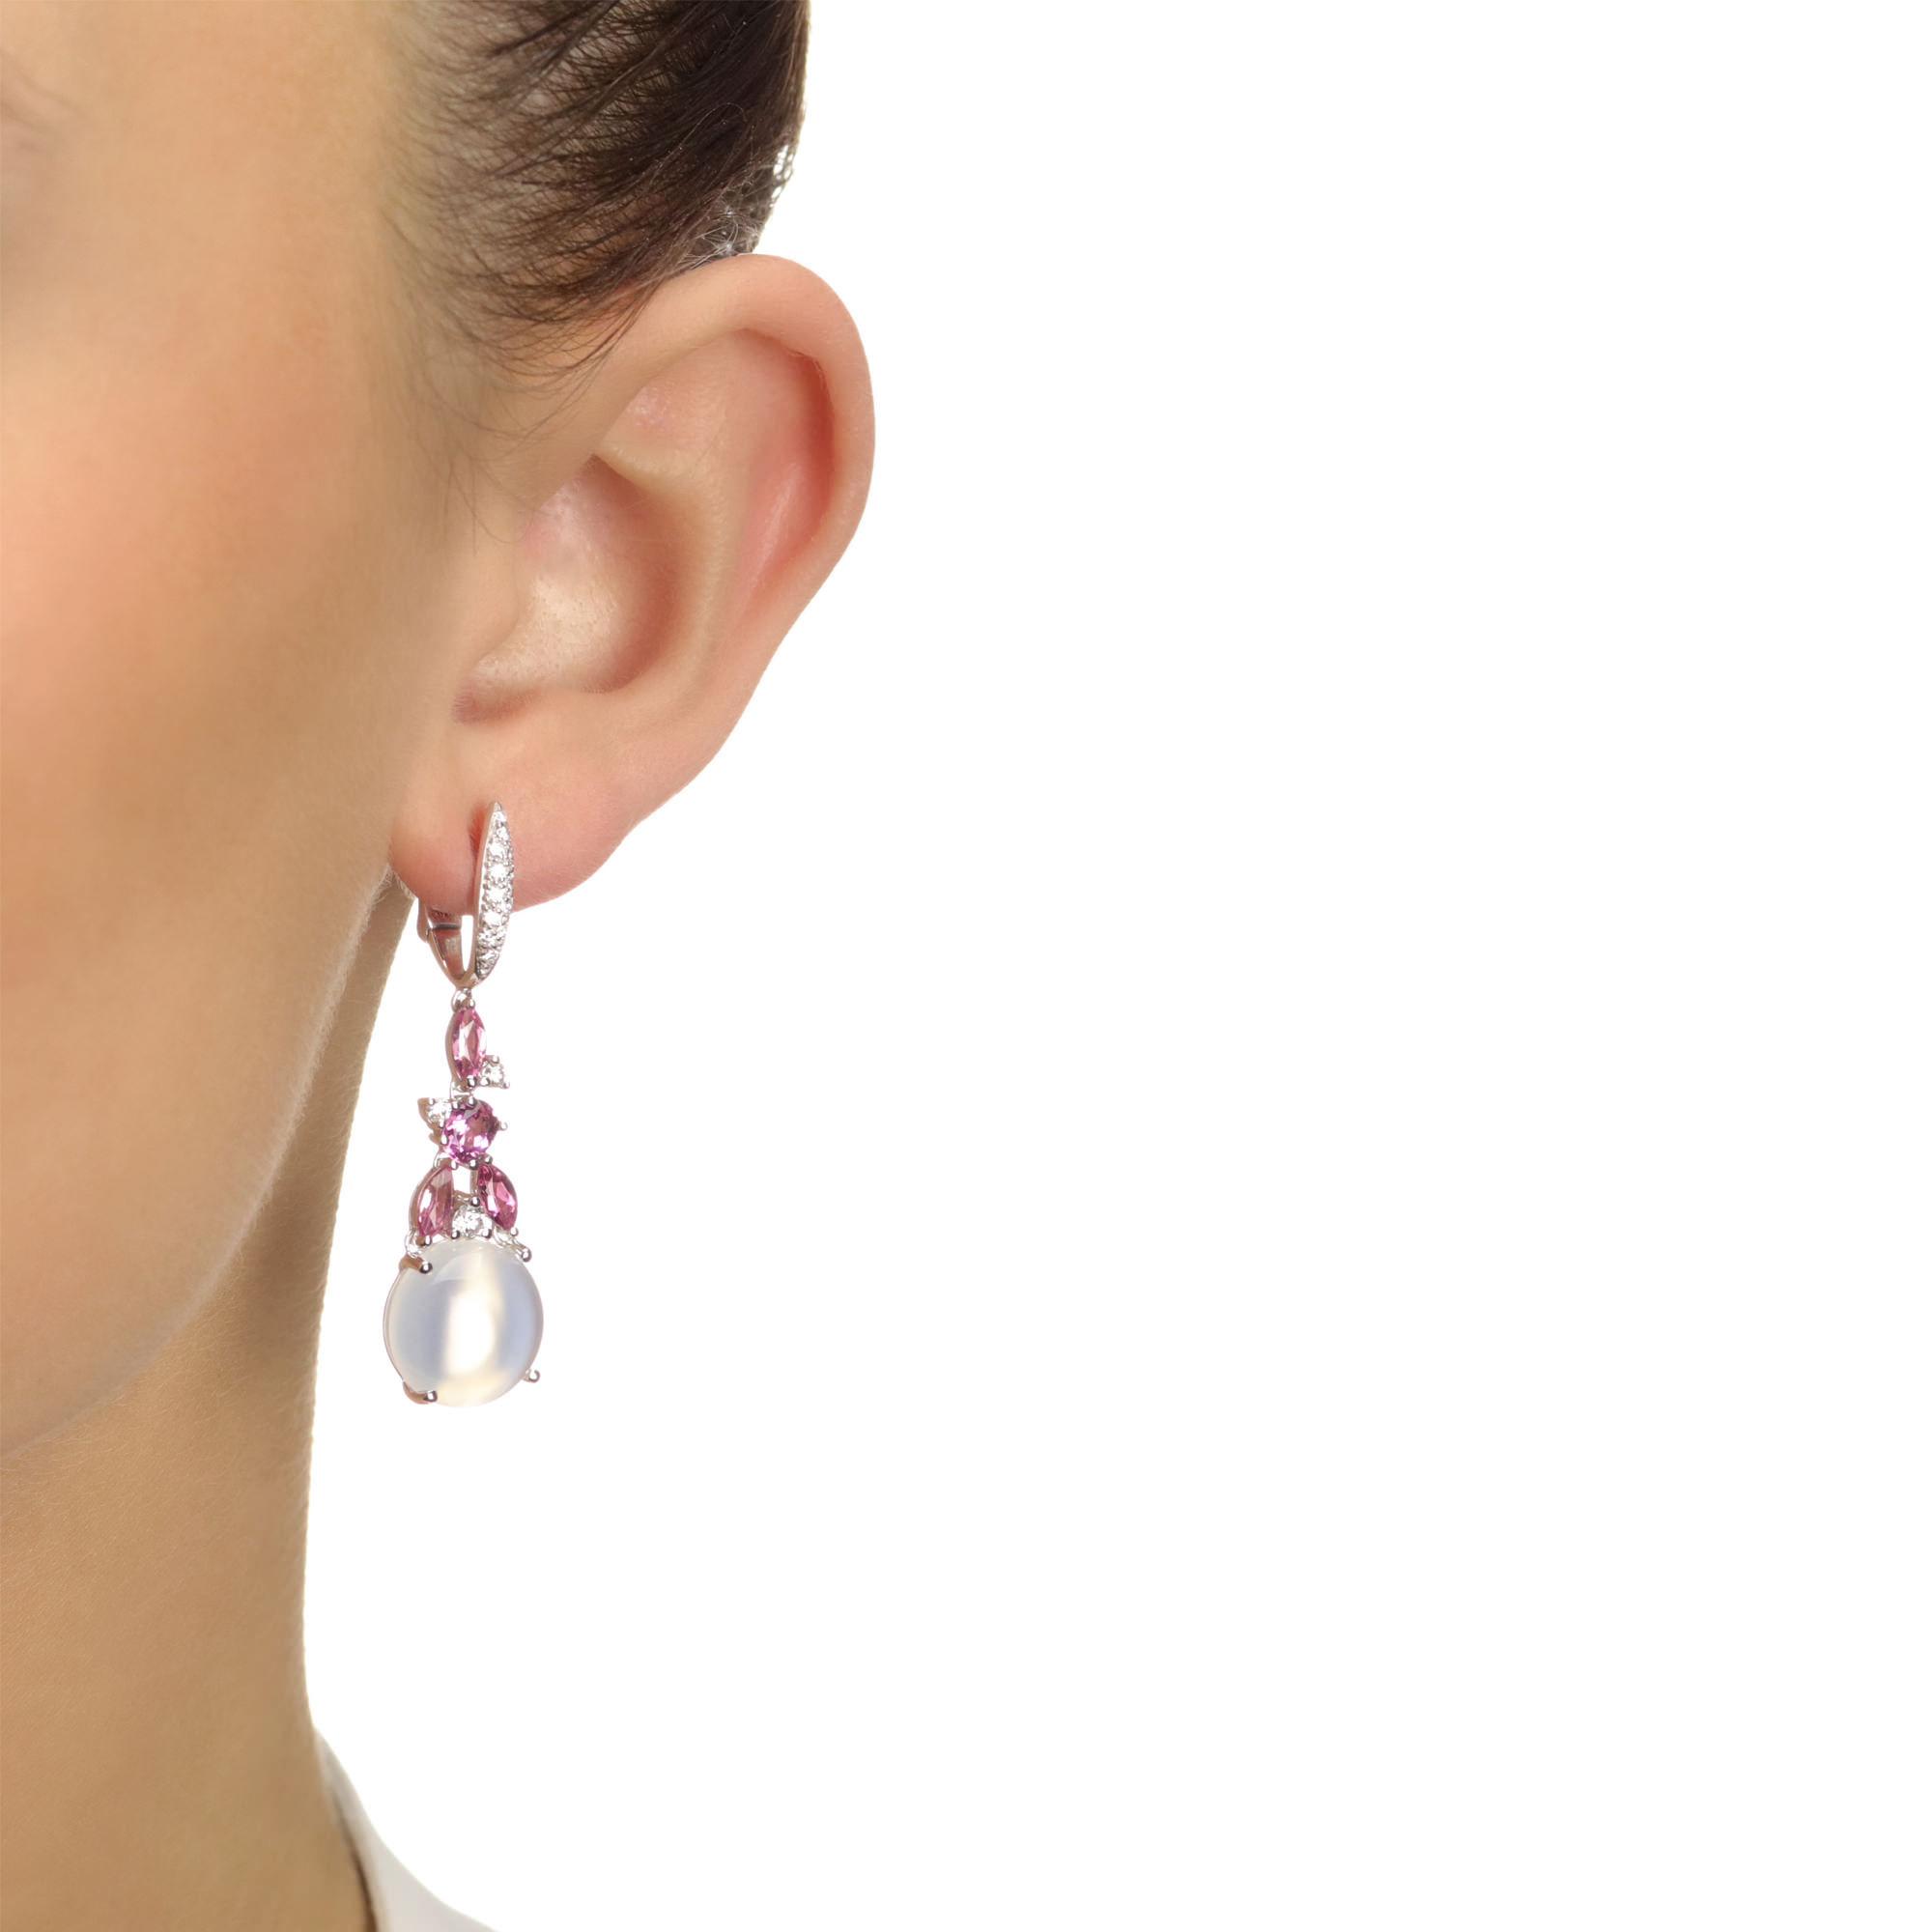 Tourmaline Moonstone Earrings